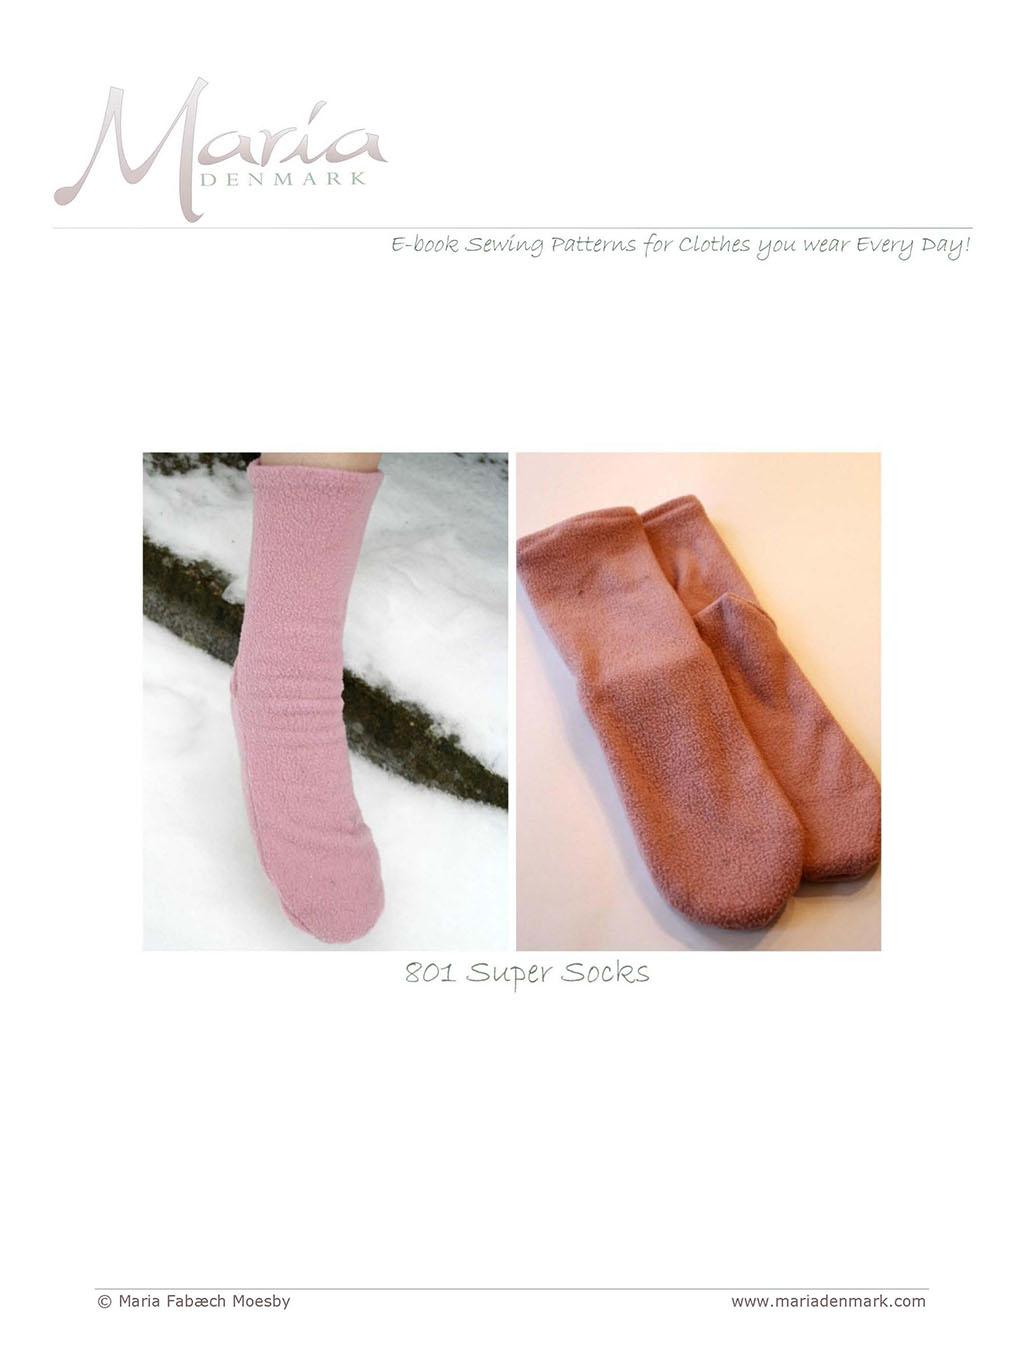 801 - Super Socks - MariaDenmark Sewing